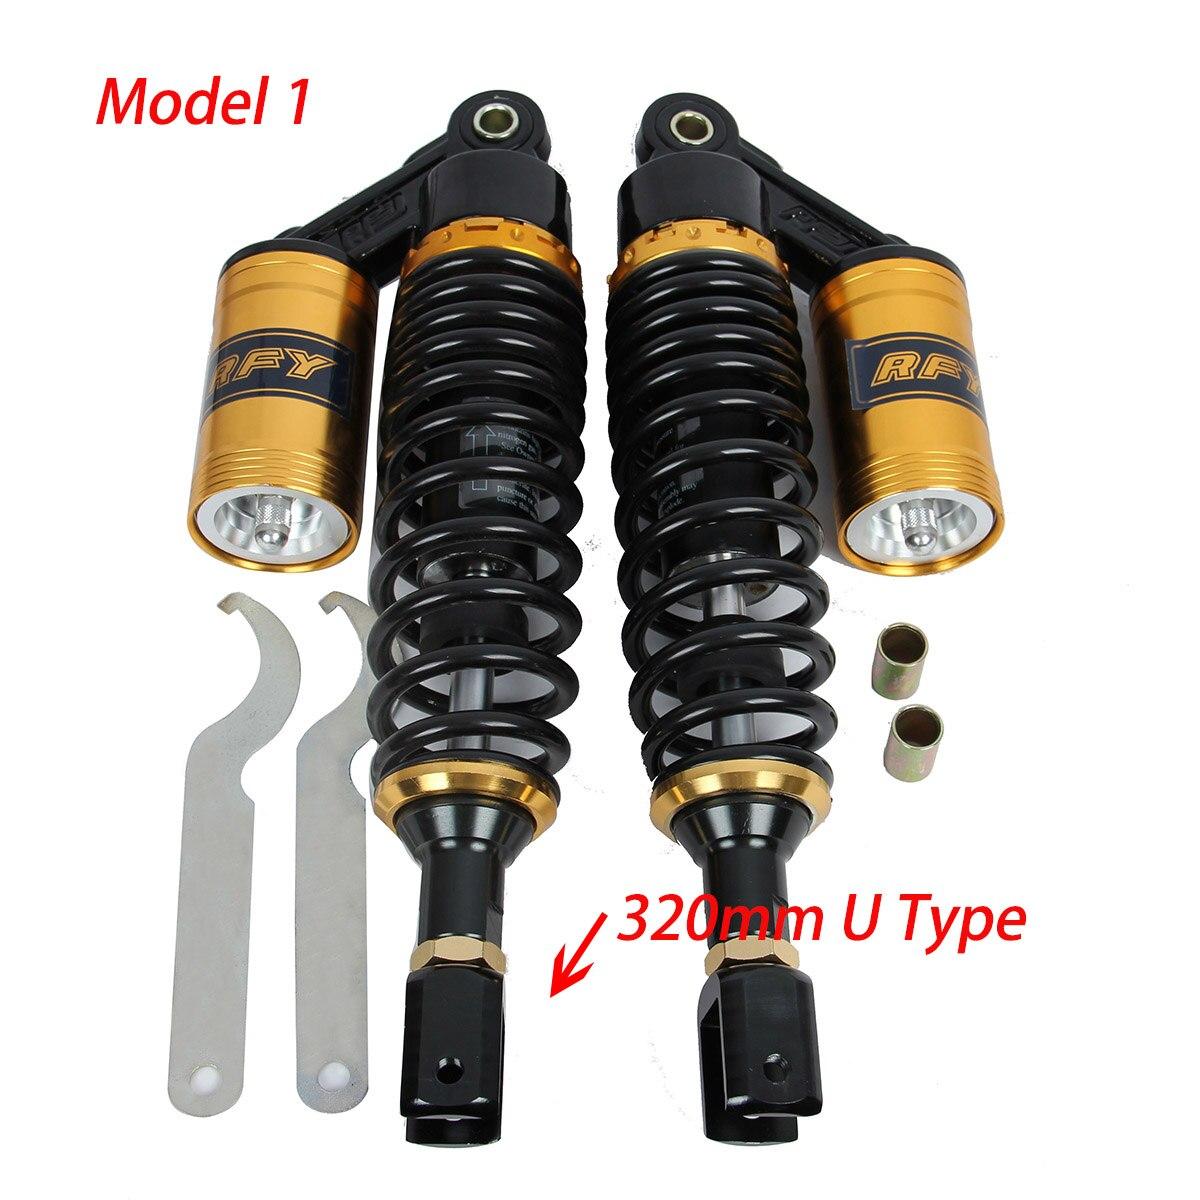 POSSBAY 320mm 340mm 360mm 380mm 400mm Motorcycle Rear Air Shock Absorbers Suspension for Honda Yamaha Suzuki Amortiguador Moto